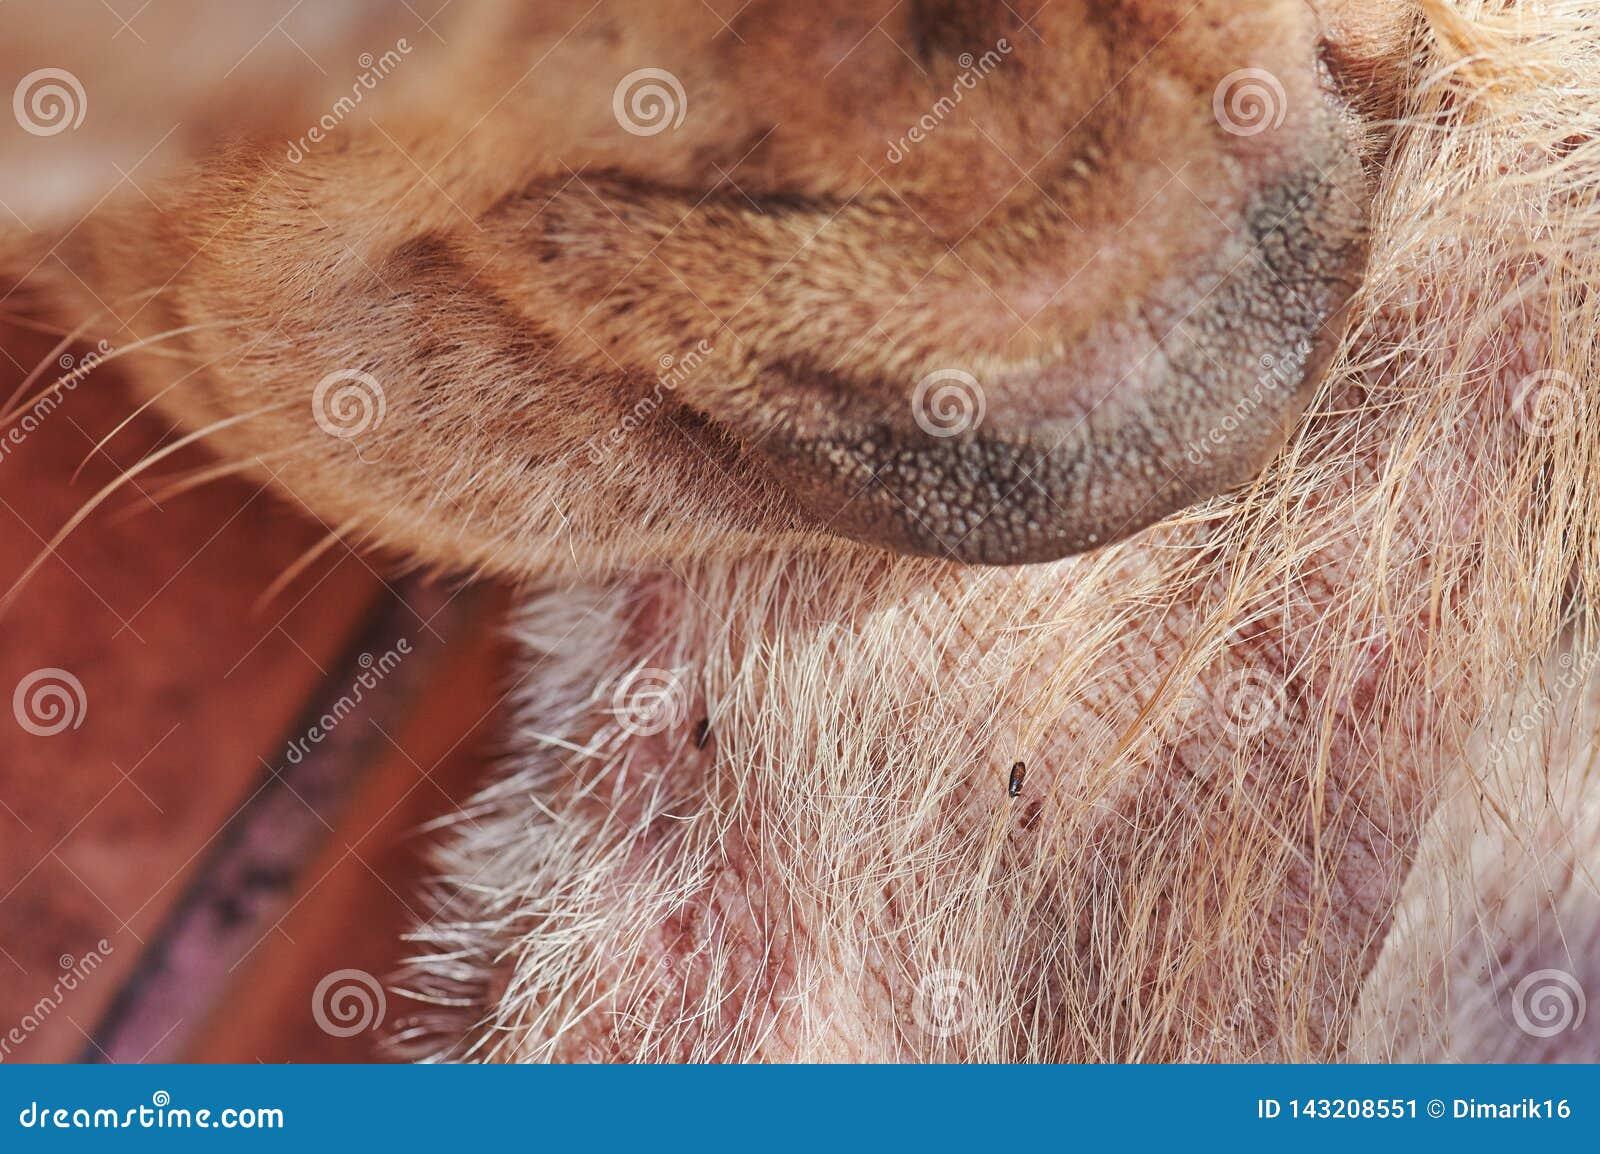 Dog bite flea on fur